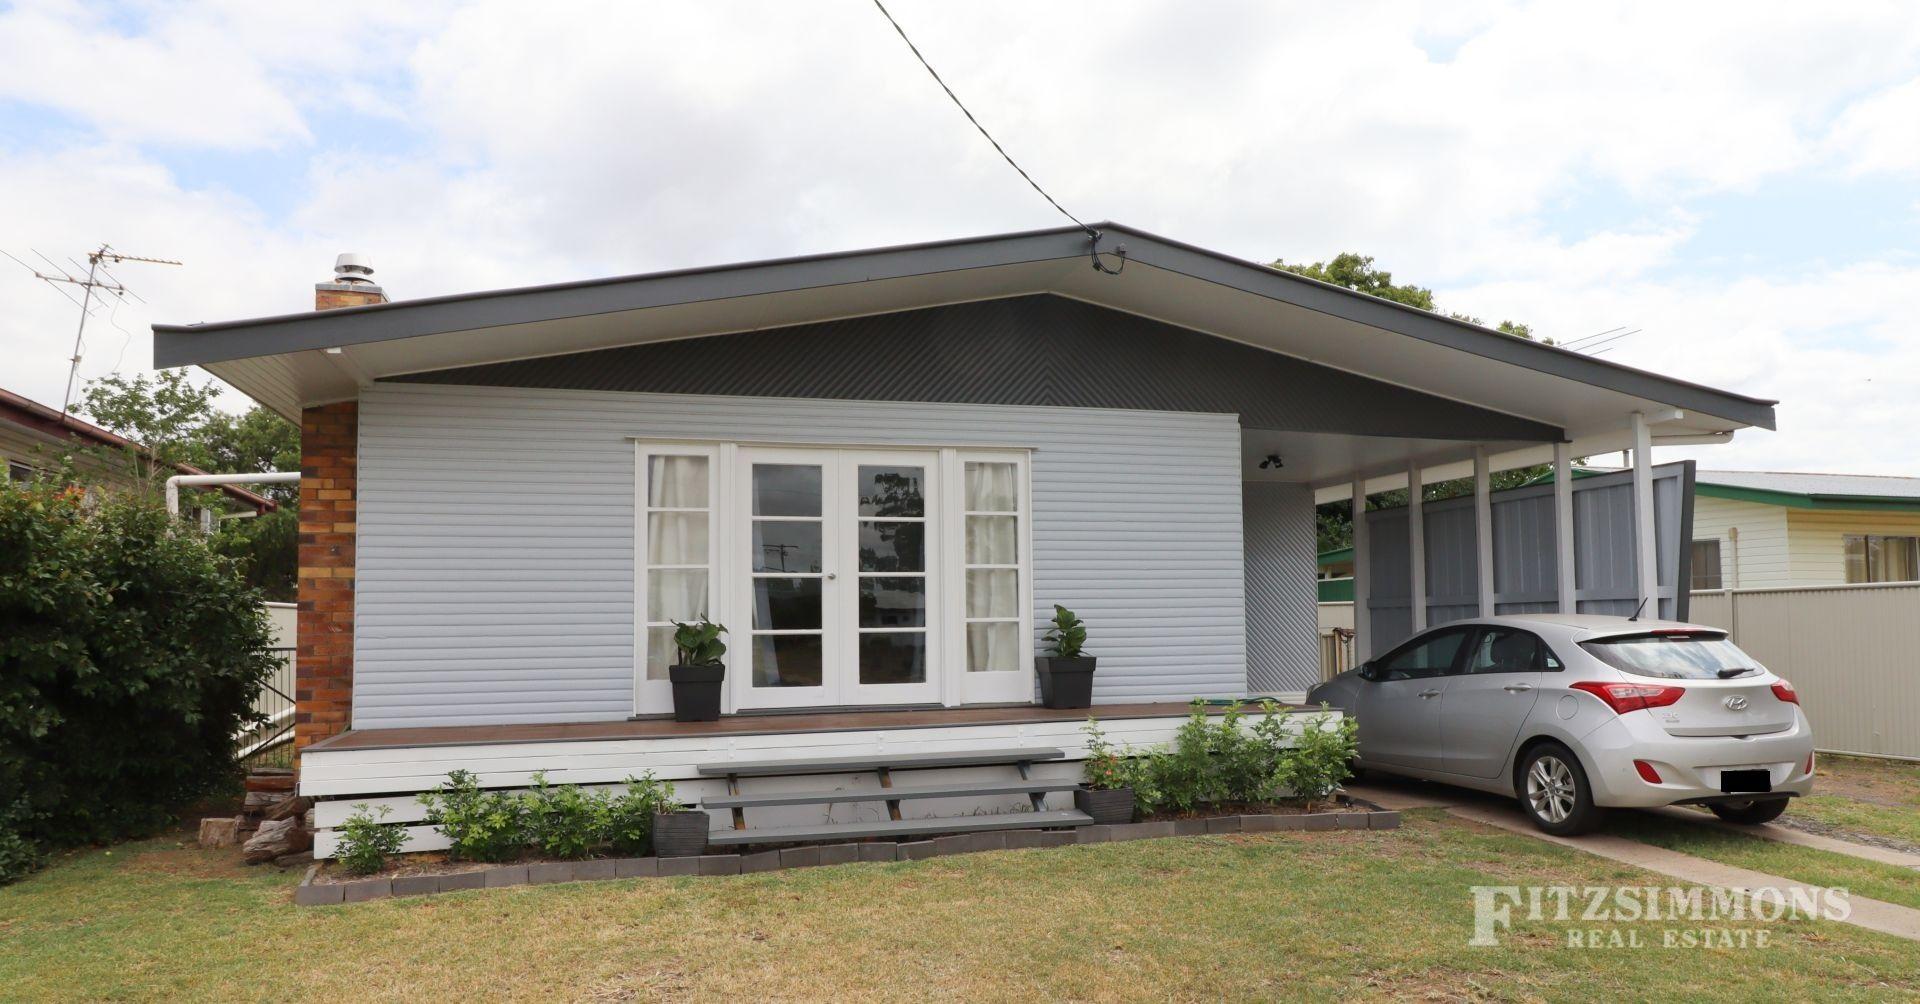 15 Swan Street, Dalby QLD 4405, Image 0